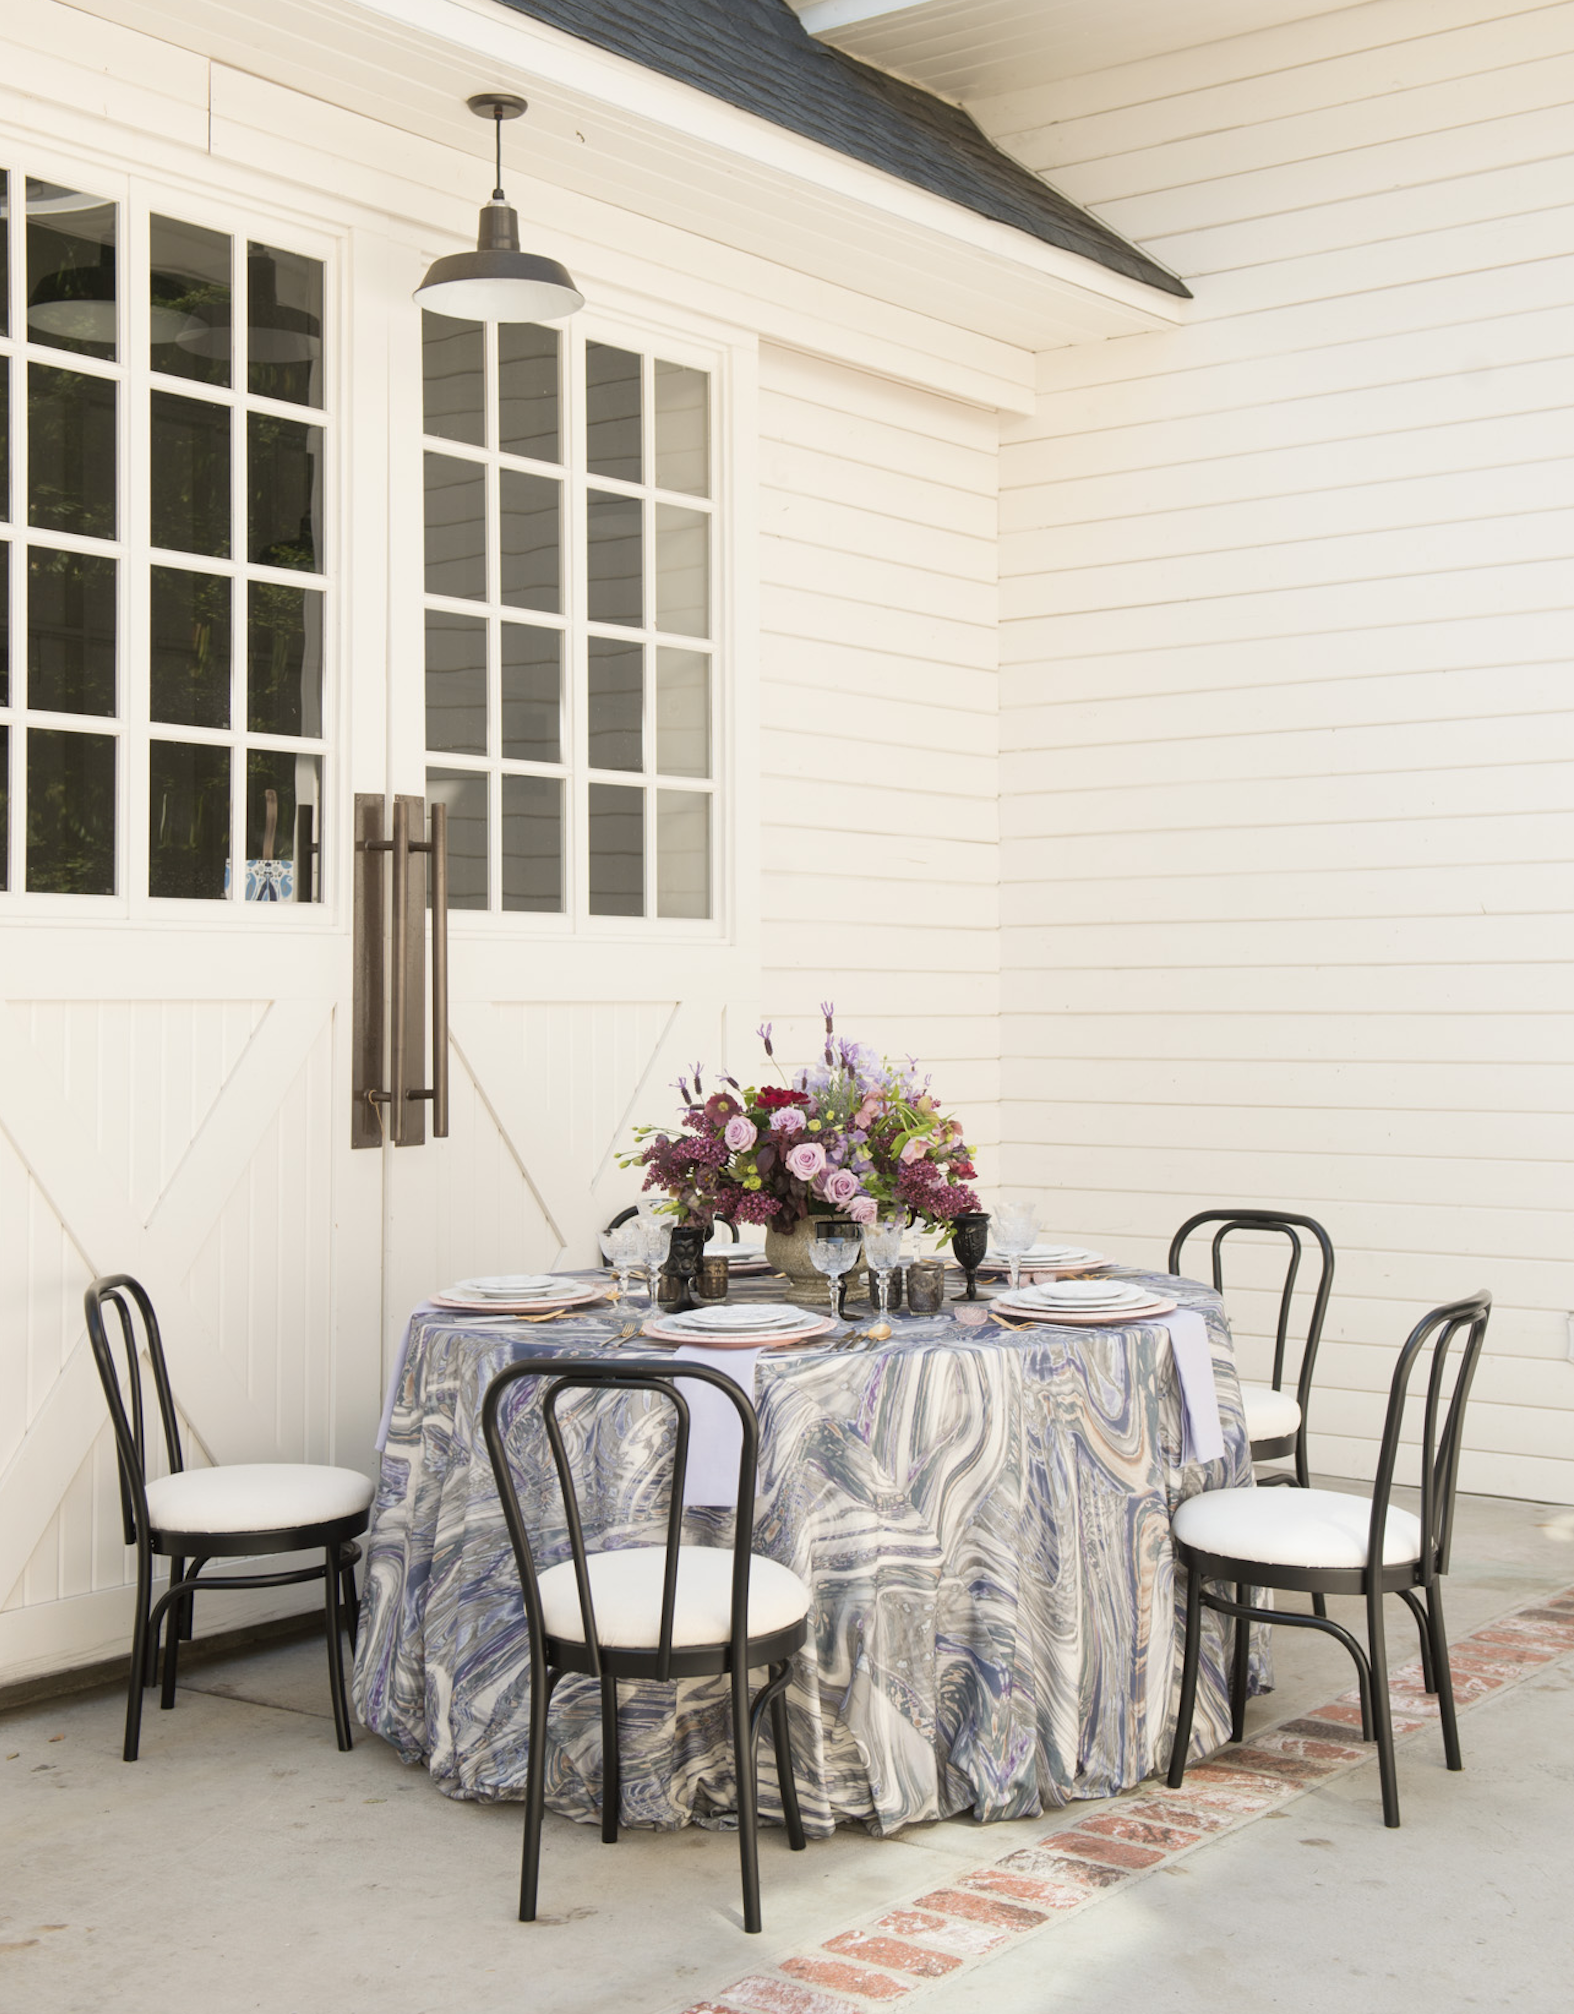 La Tavola Fine Linen Rental New Age Granite With Tuscany Lilac